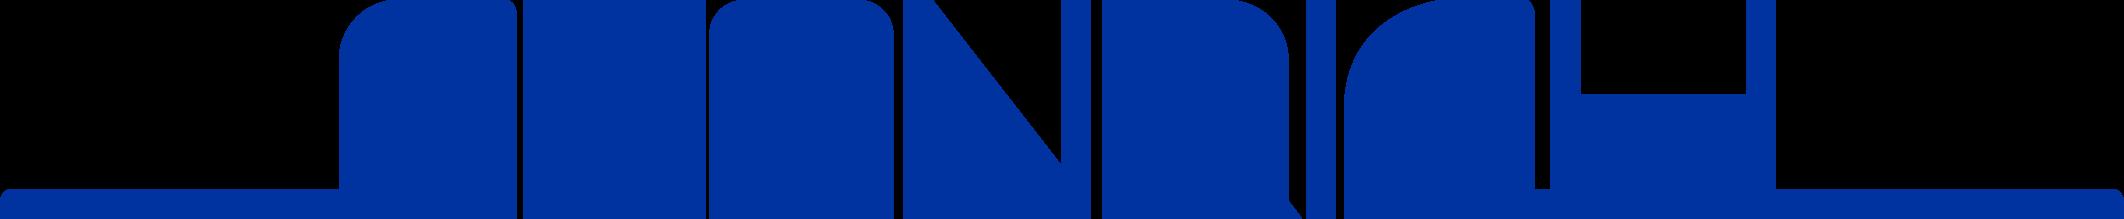 Stonrich Pte Ltd